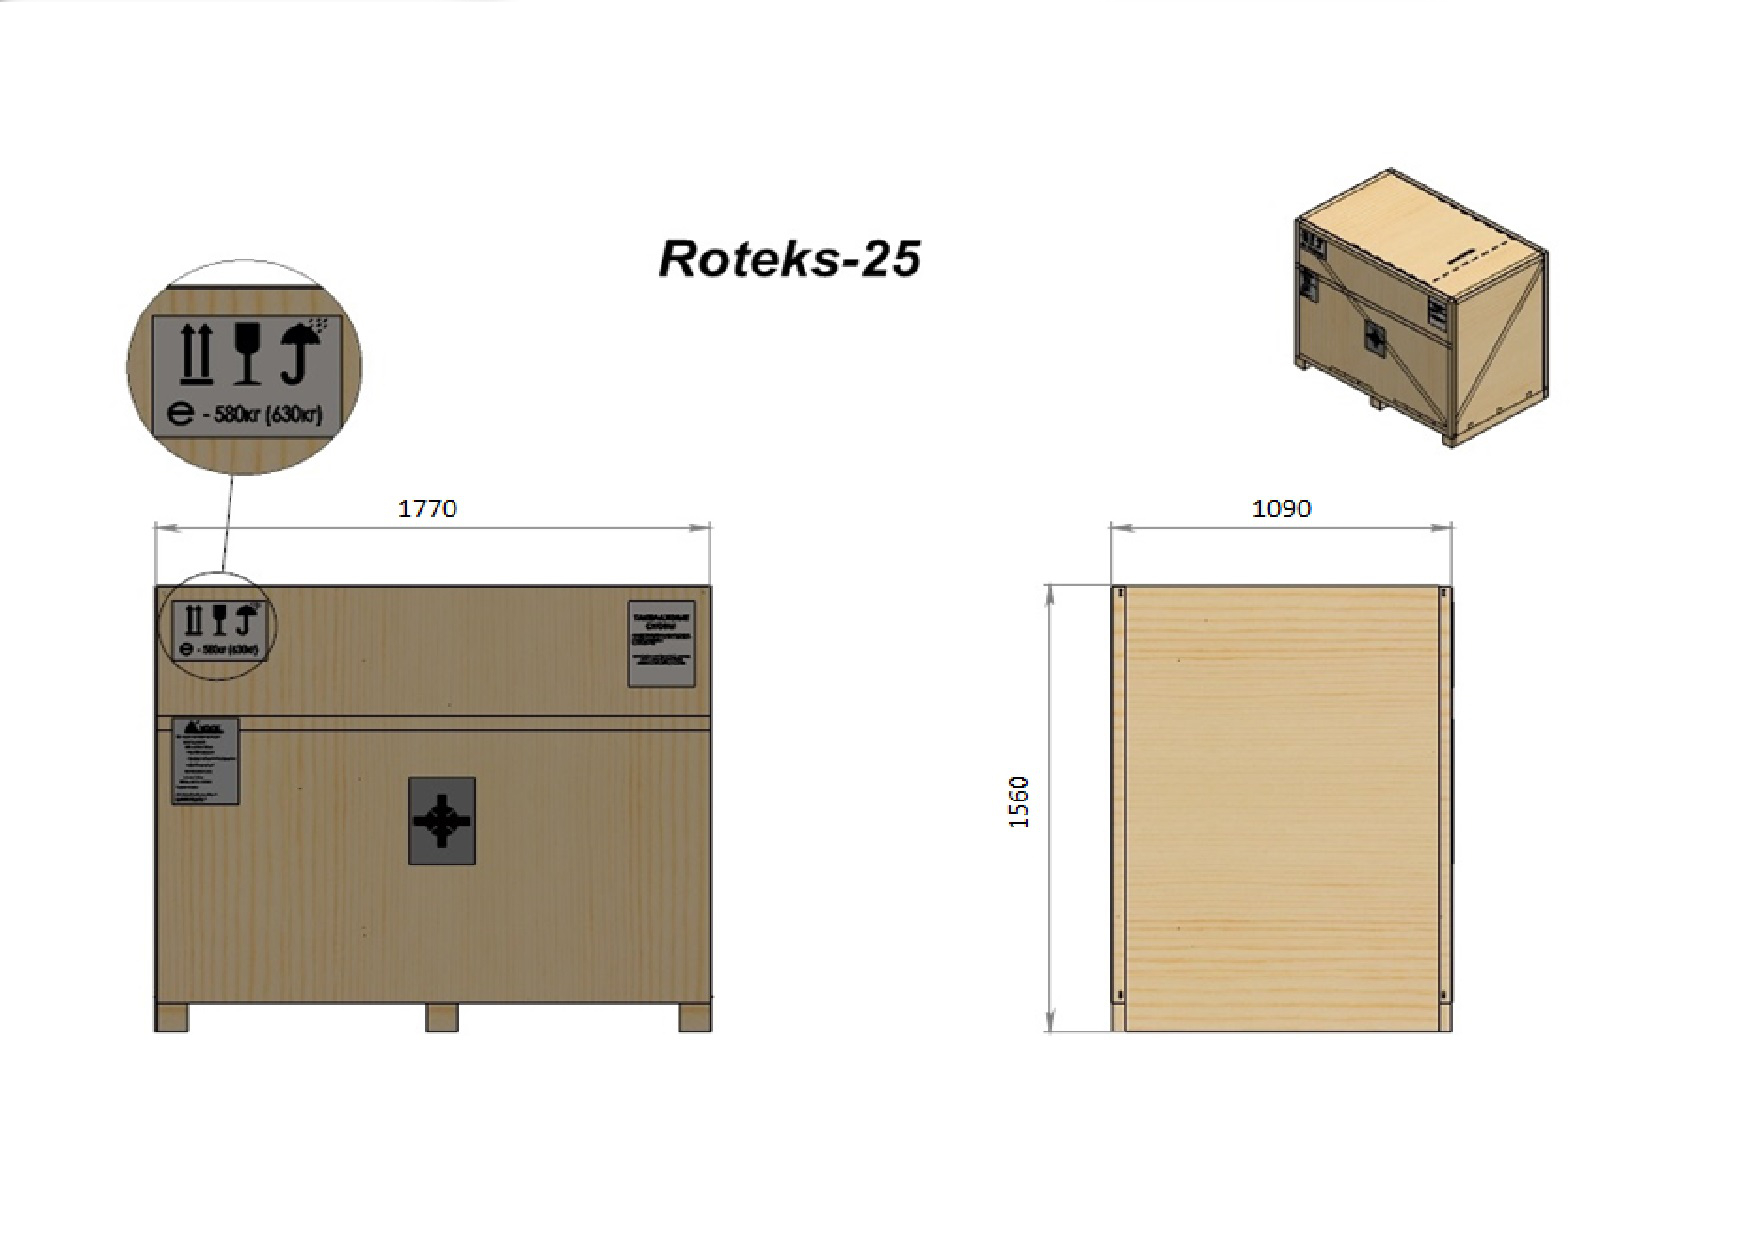 Ротекс-25